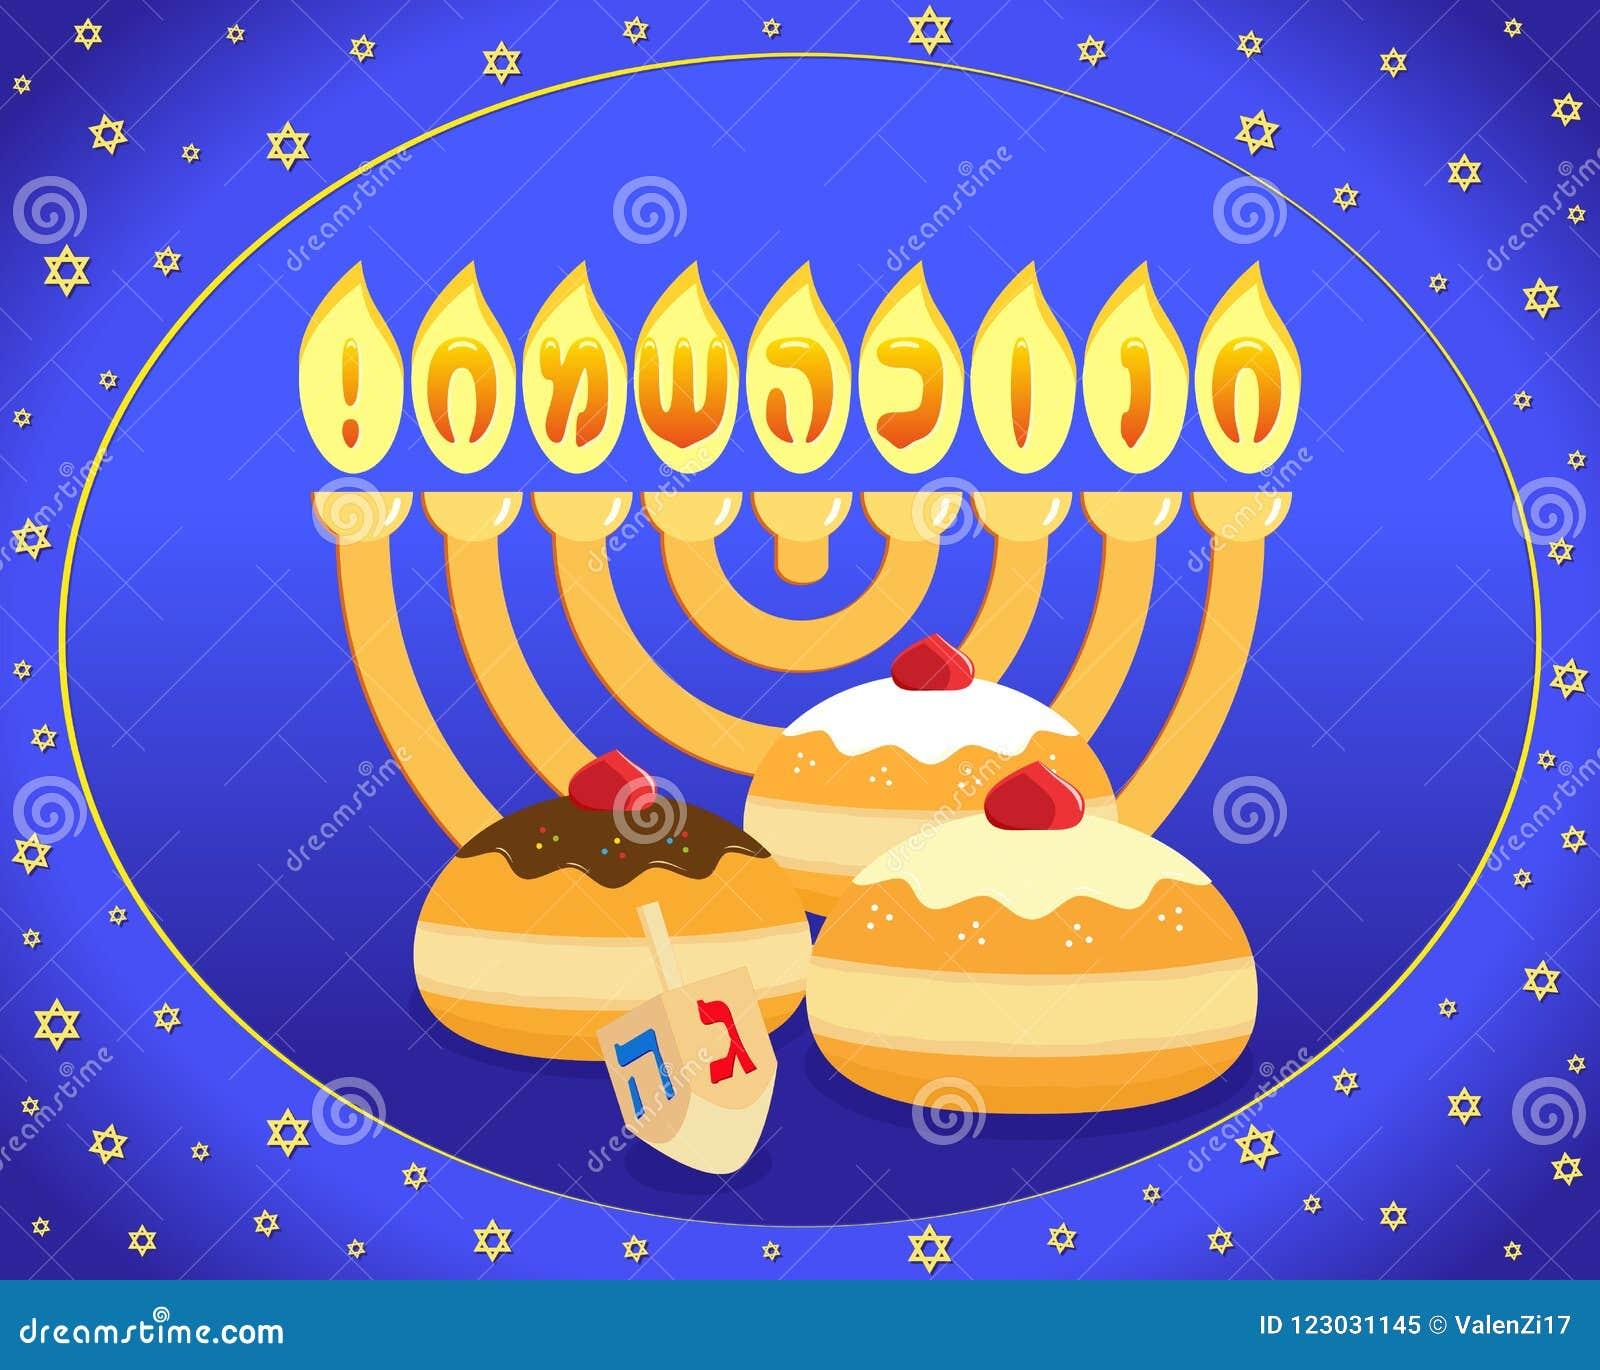 Jewish holiday of Hanukkah